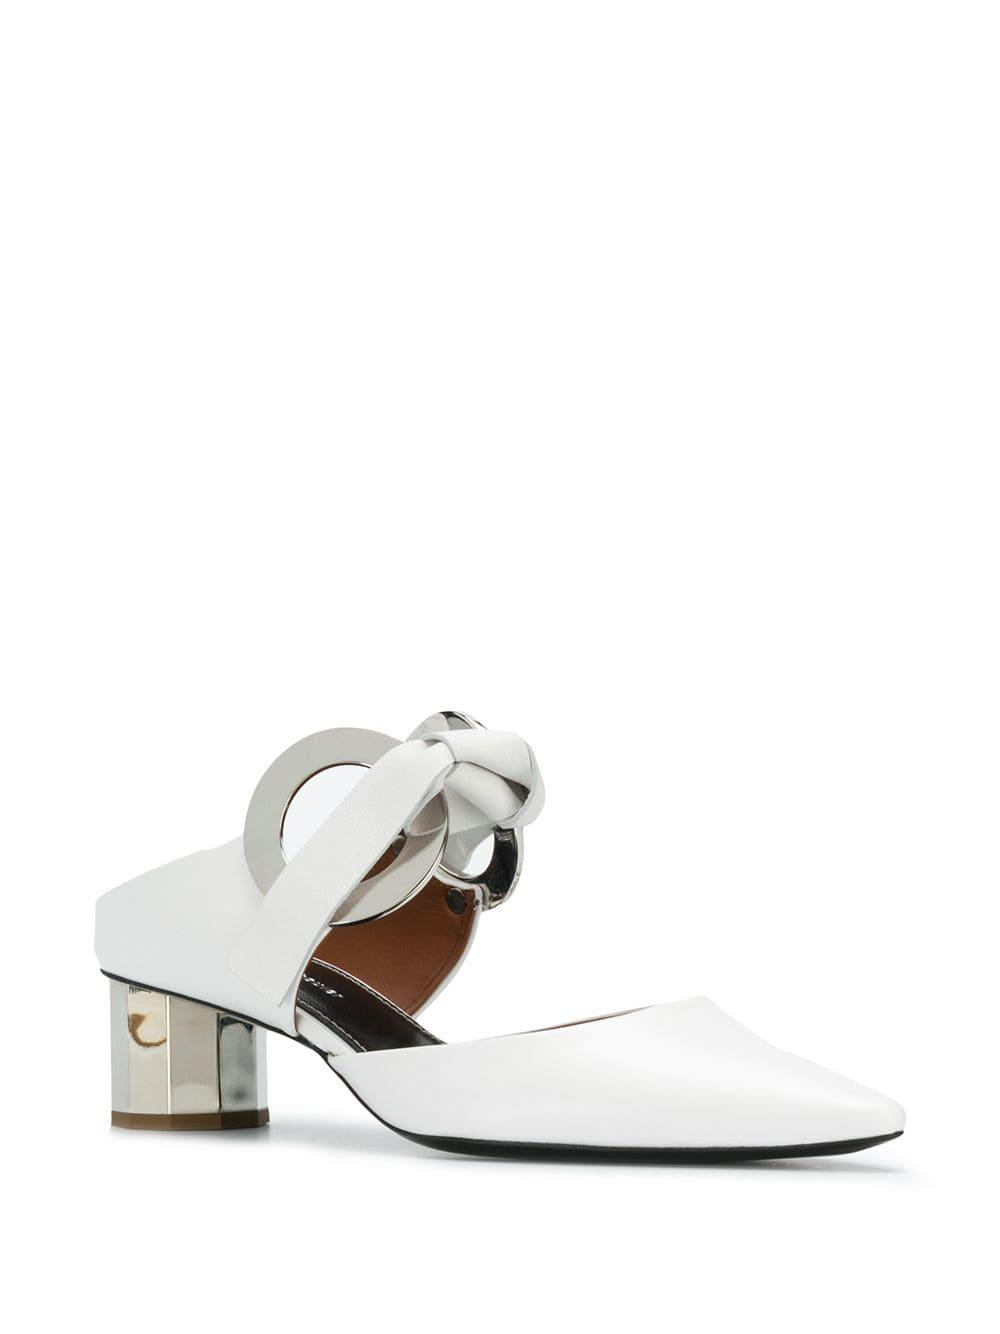 4b6abf687c9 Lyst - Proenza Schouler White Metallic Heel 40 Mules in White - Save 54%